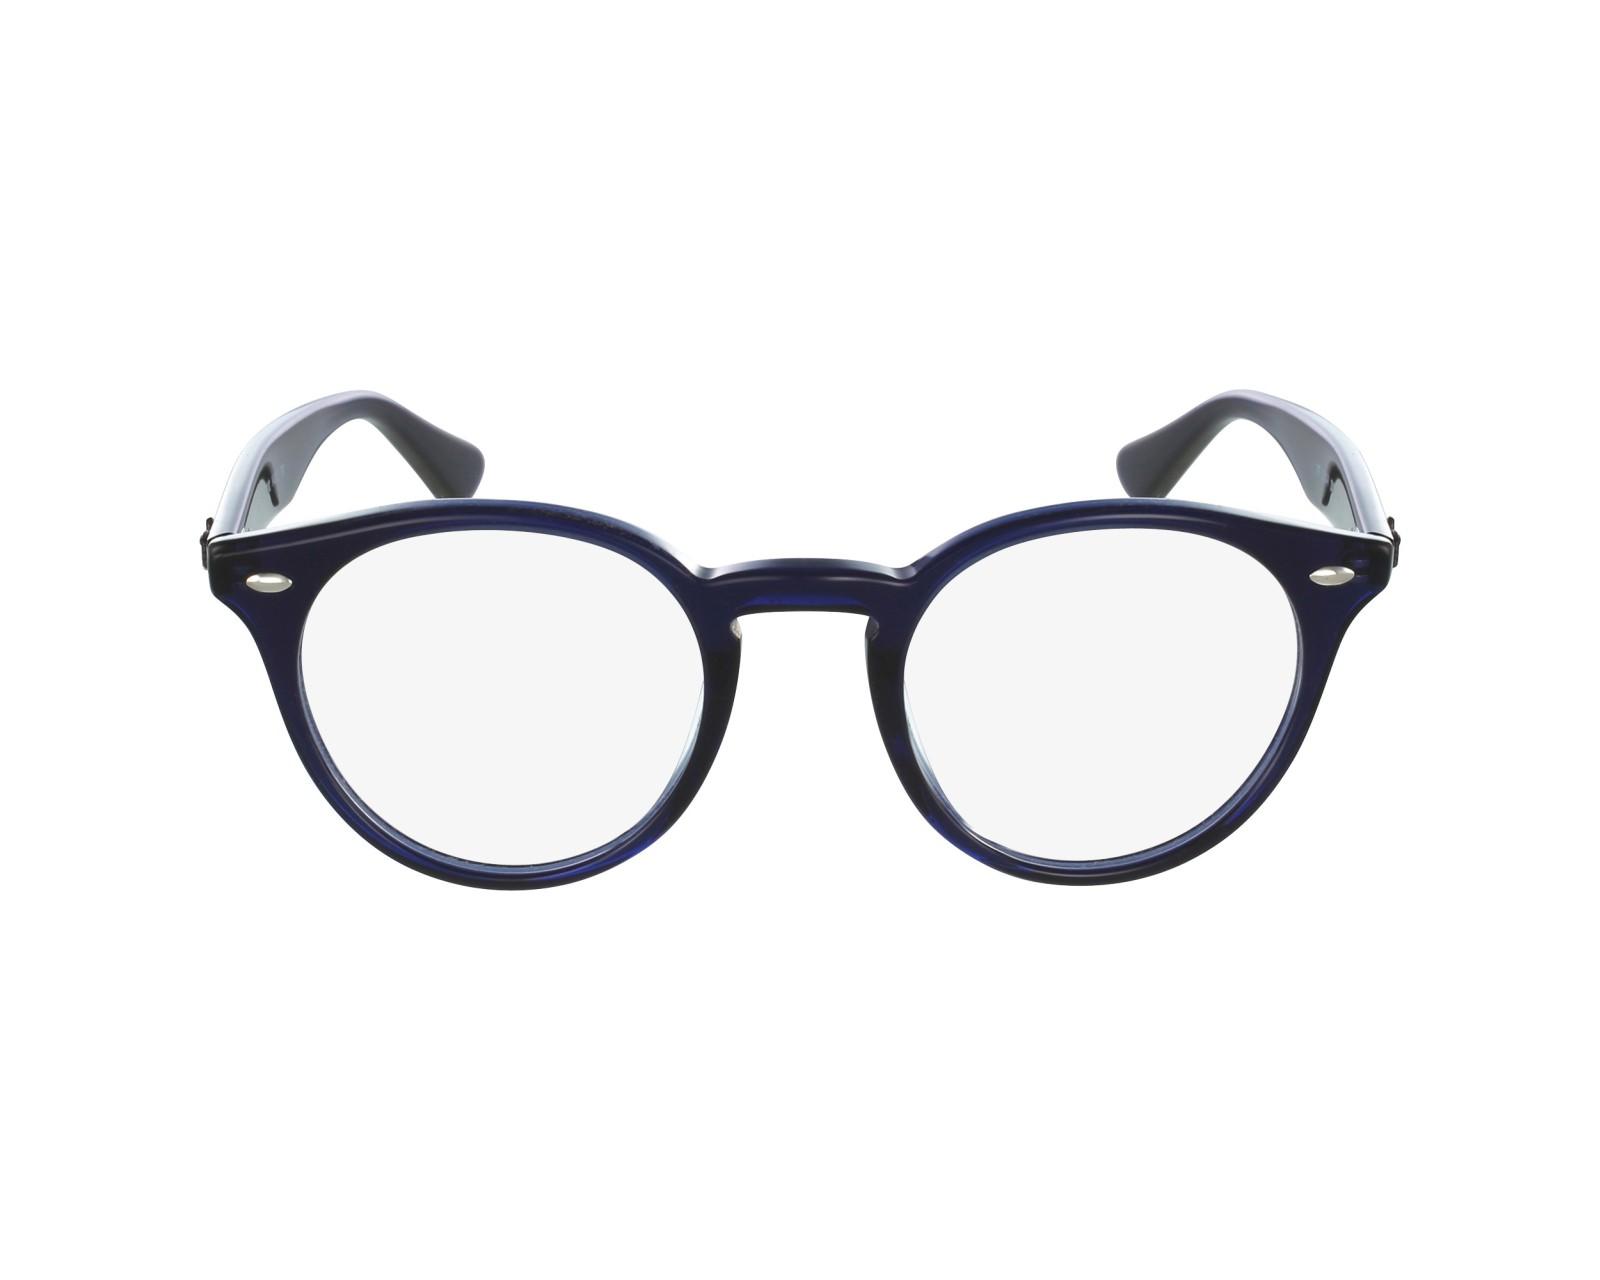 lunettes ray ban 2013 louisiana bucket brigade. Black Bedroom Furniture Sets. Home Design Ideas